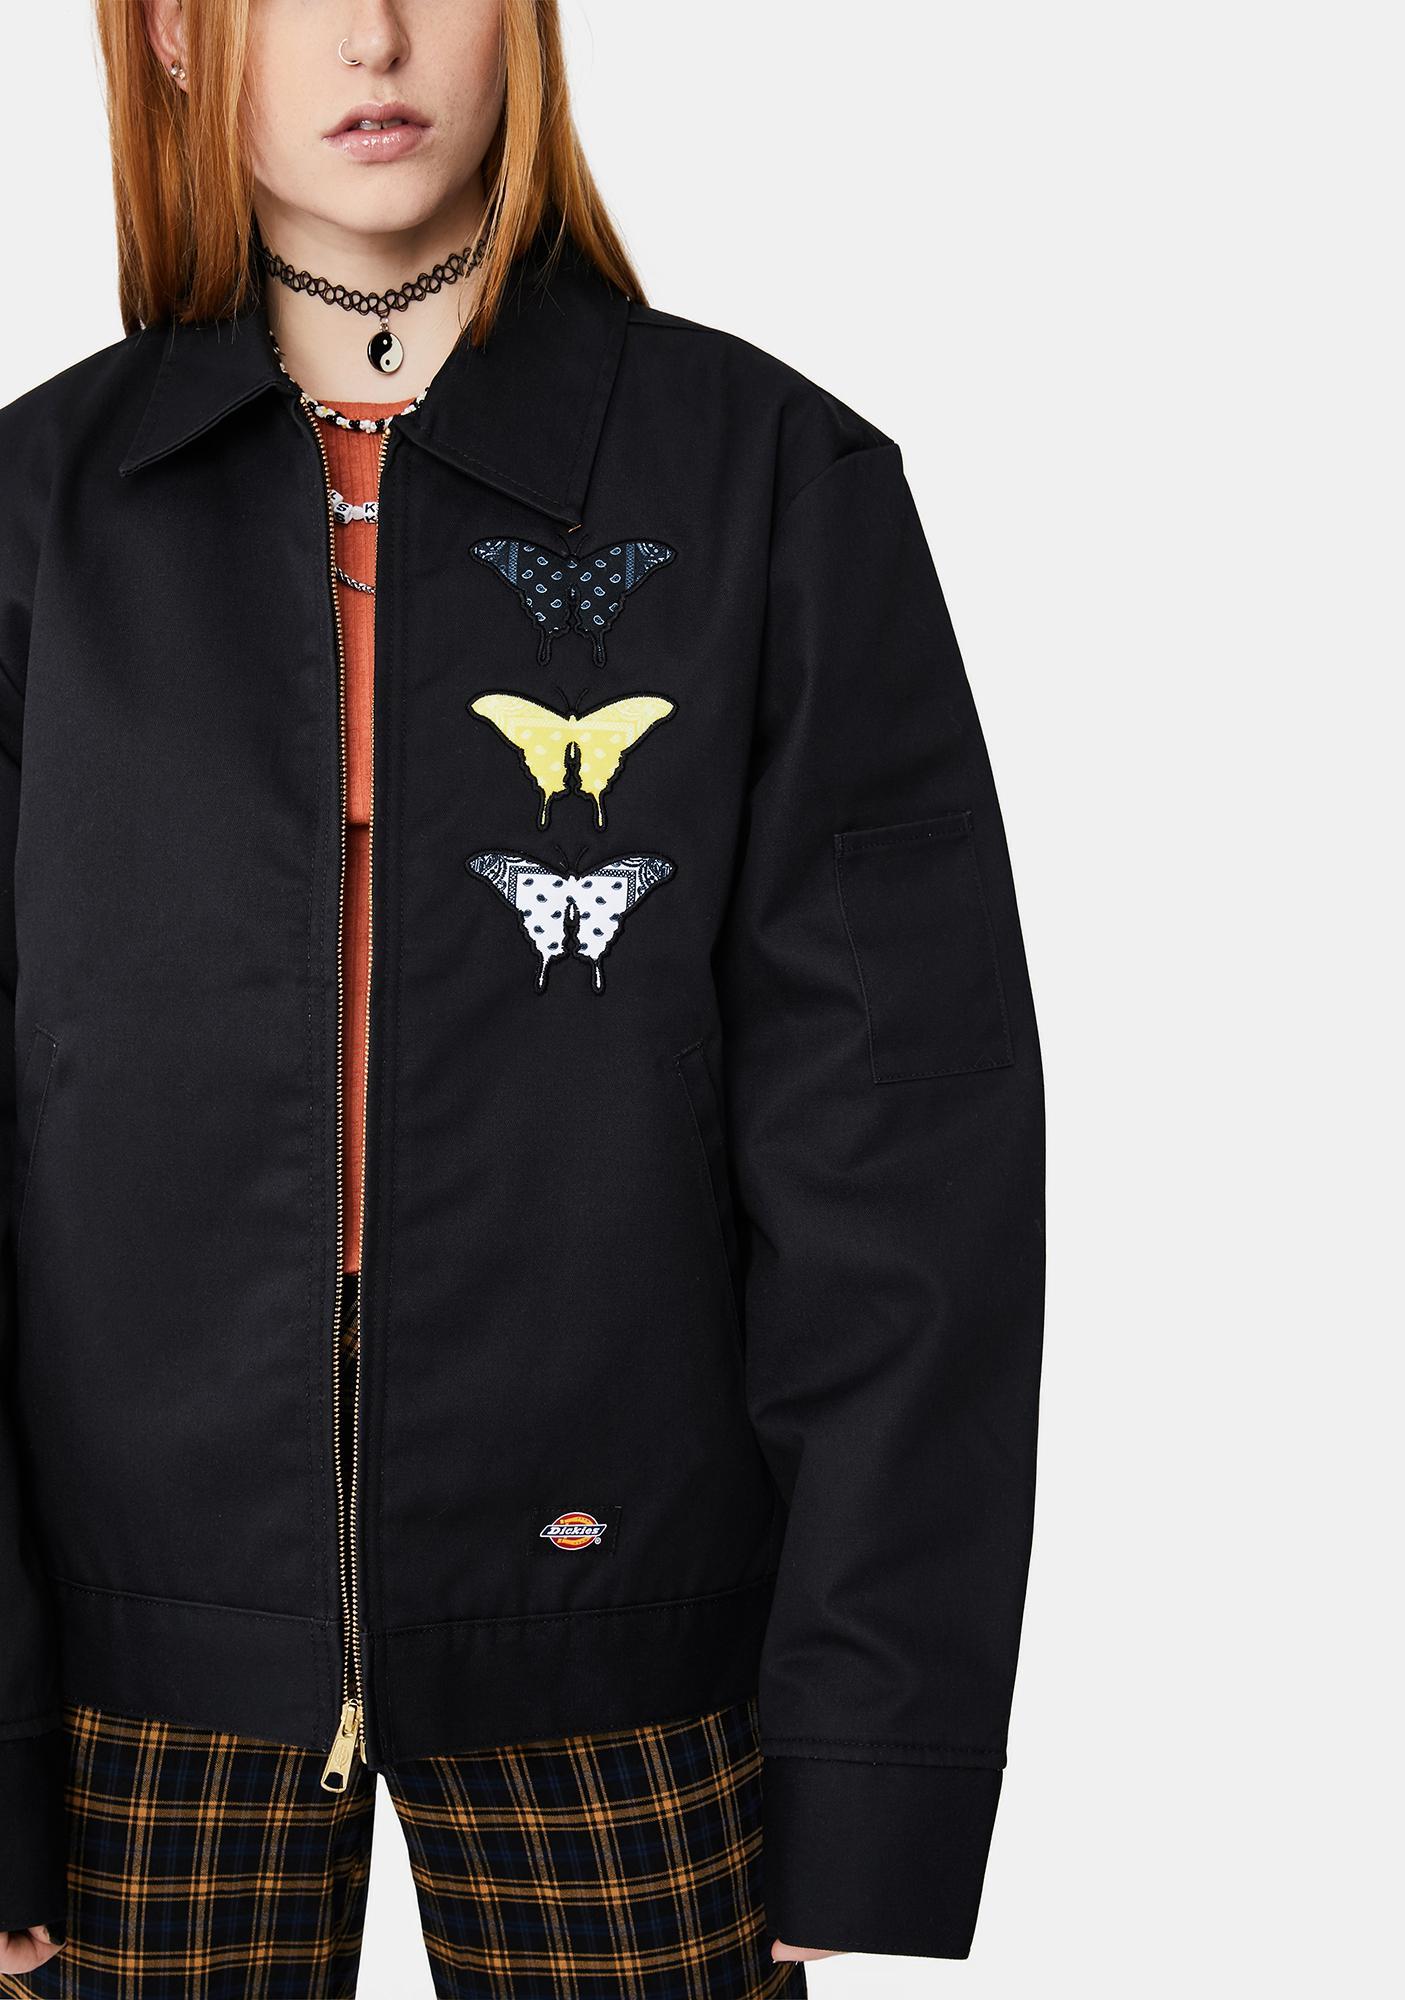 Funeral Bandana Butterfly Eisenhower Bomber Jacket